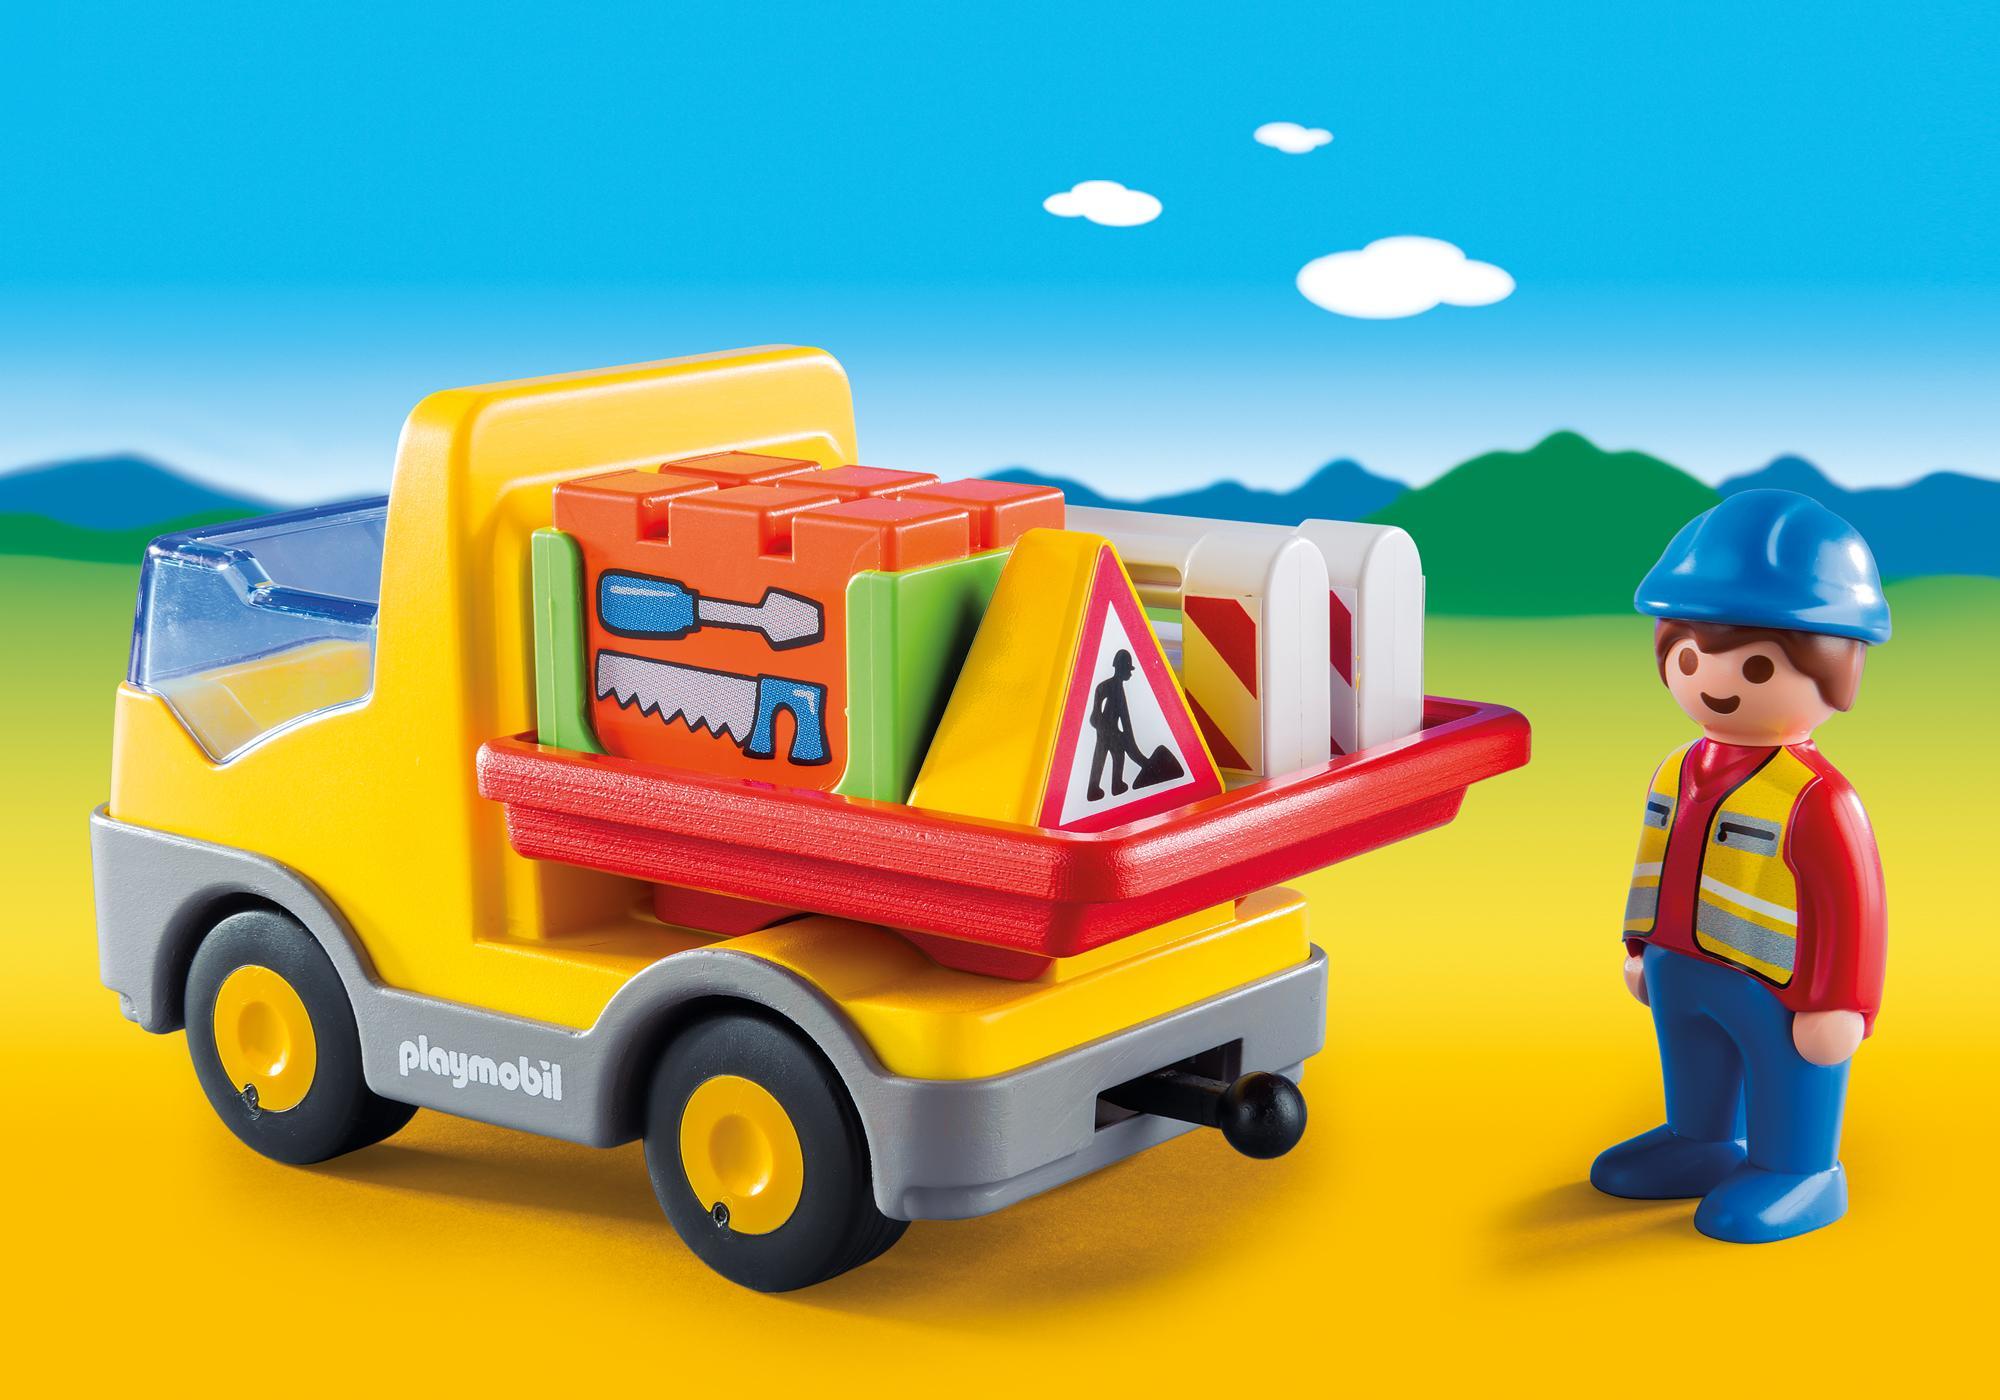 http://media.playmobil.com/i/playmobil/6960_product_extra1/1.2.3 Camión de Construcción